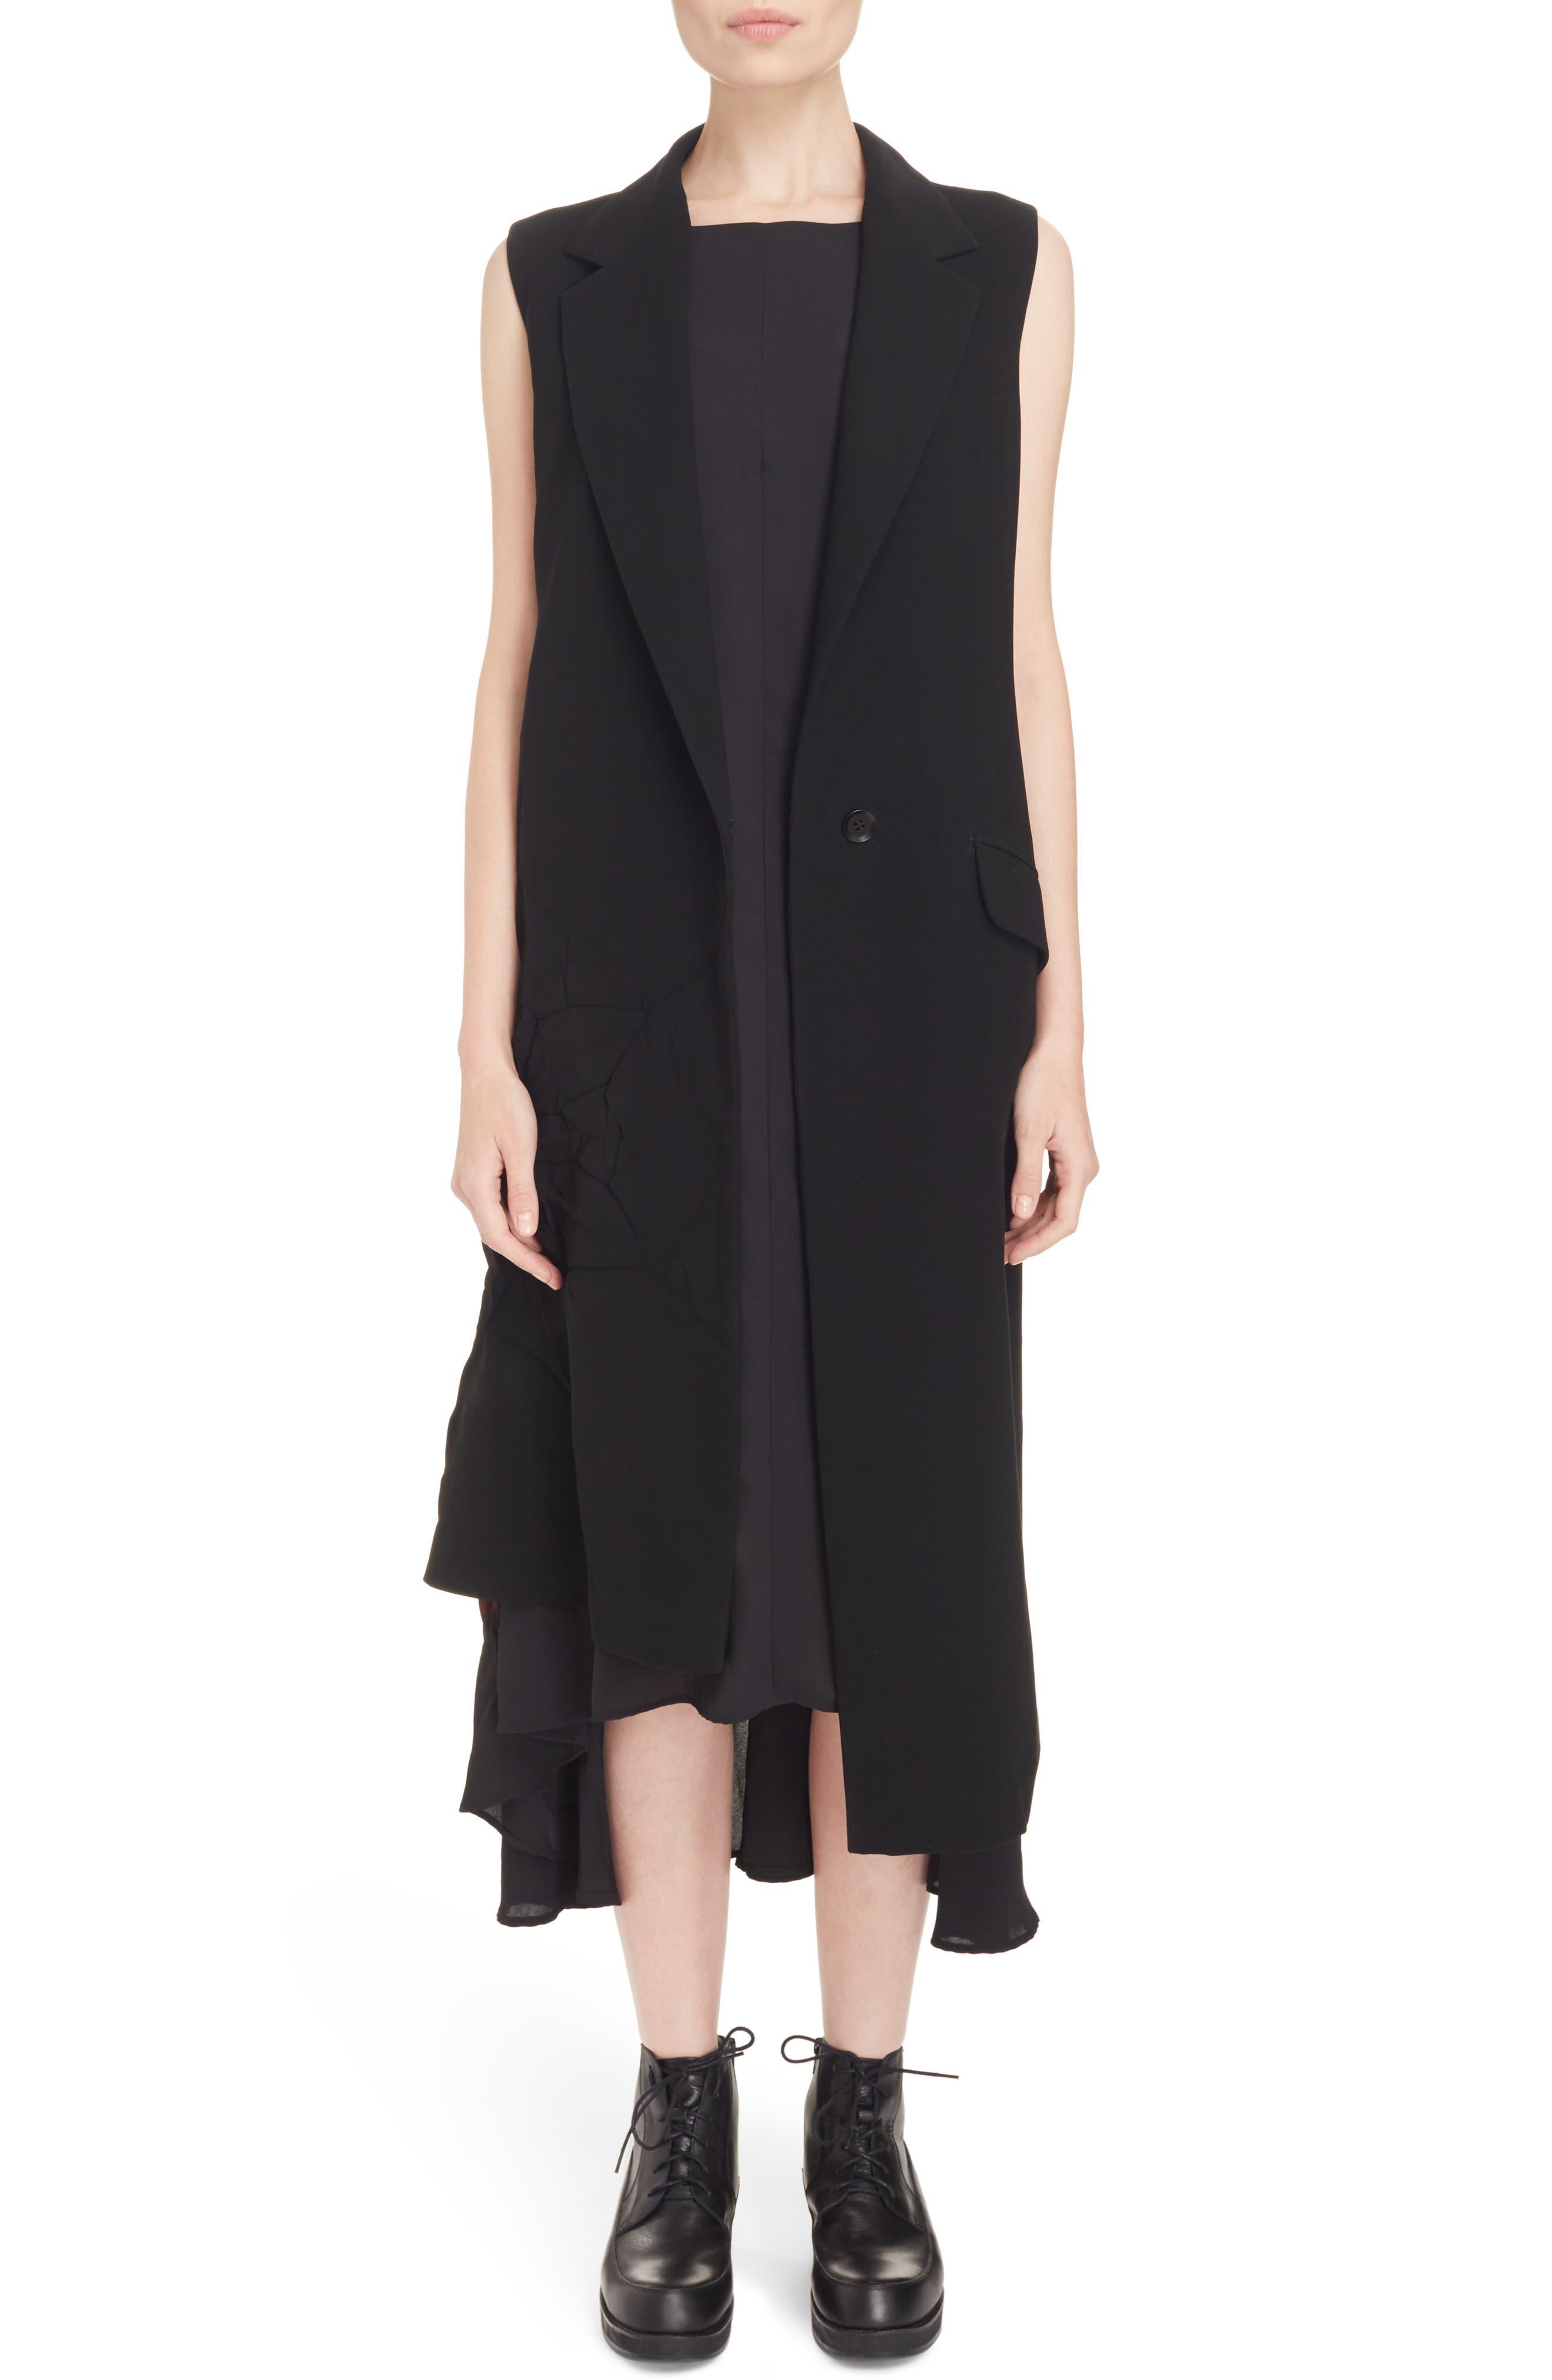 Y's by Yohji Yamamoto Asymmetrical Vest